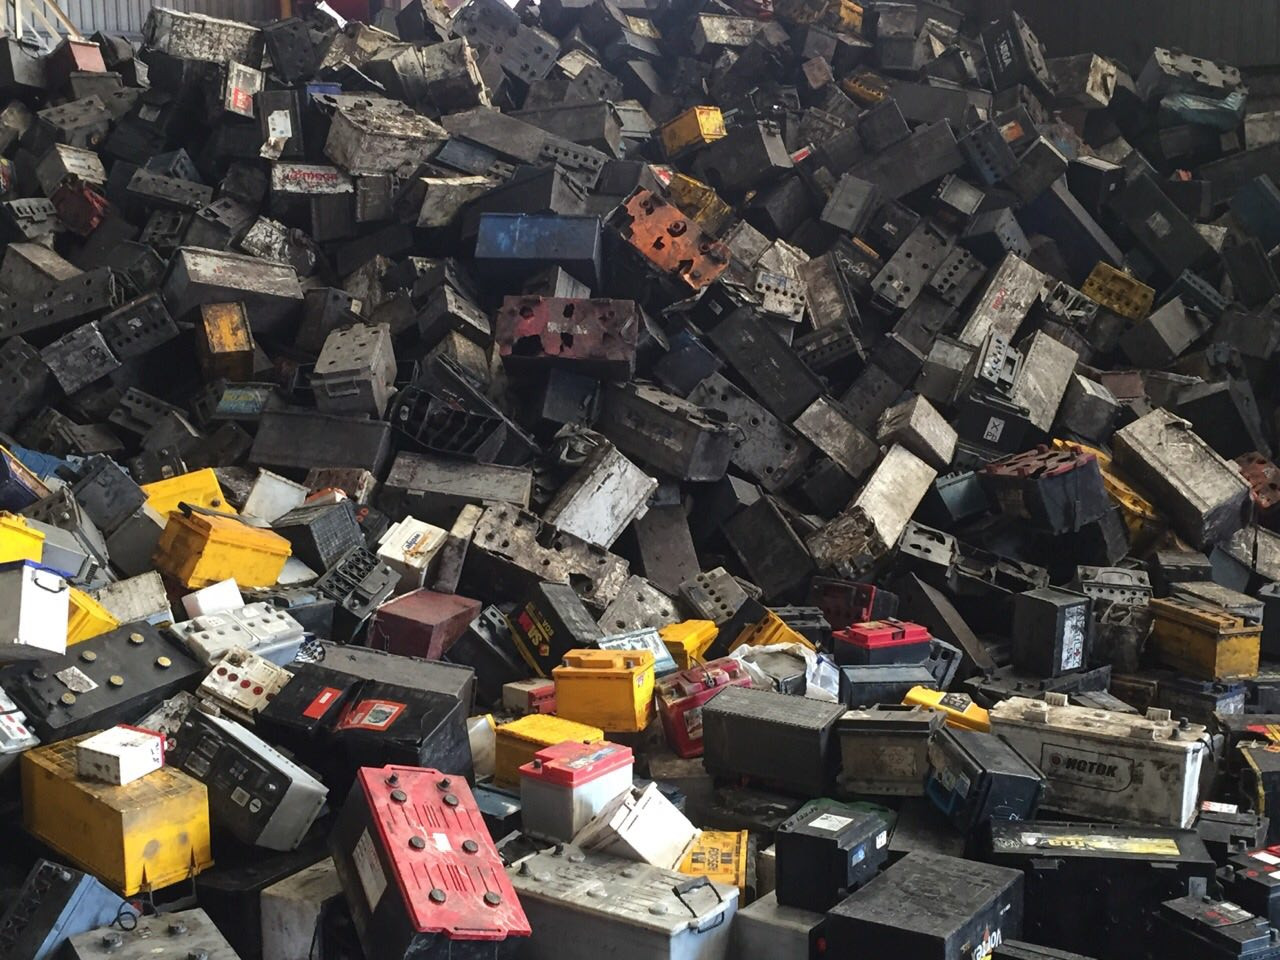 Металобрухт свинцевих батарей в ебонітових моноблоках